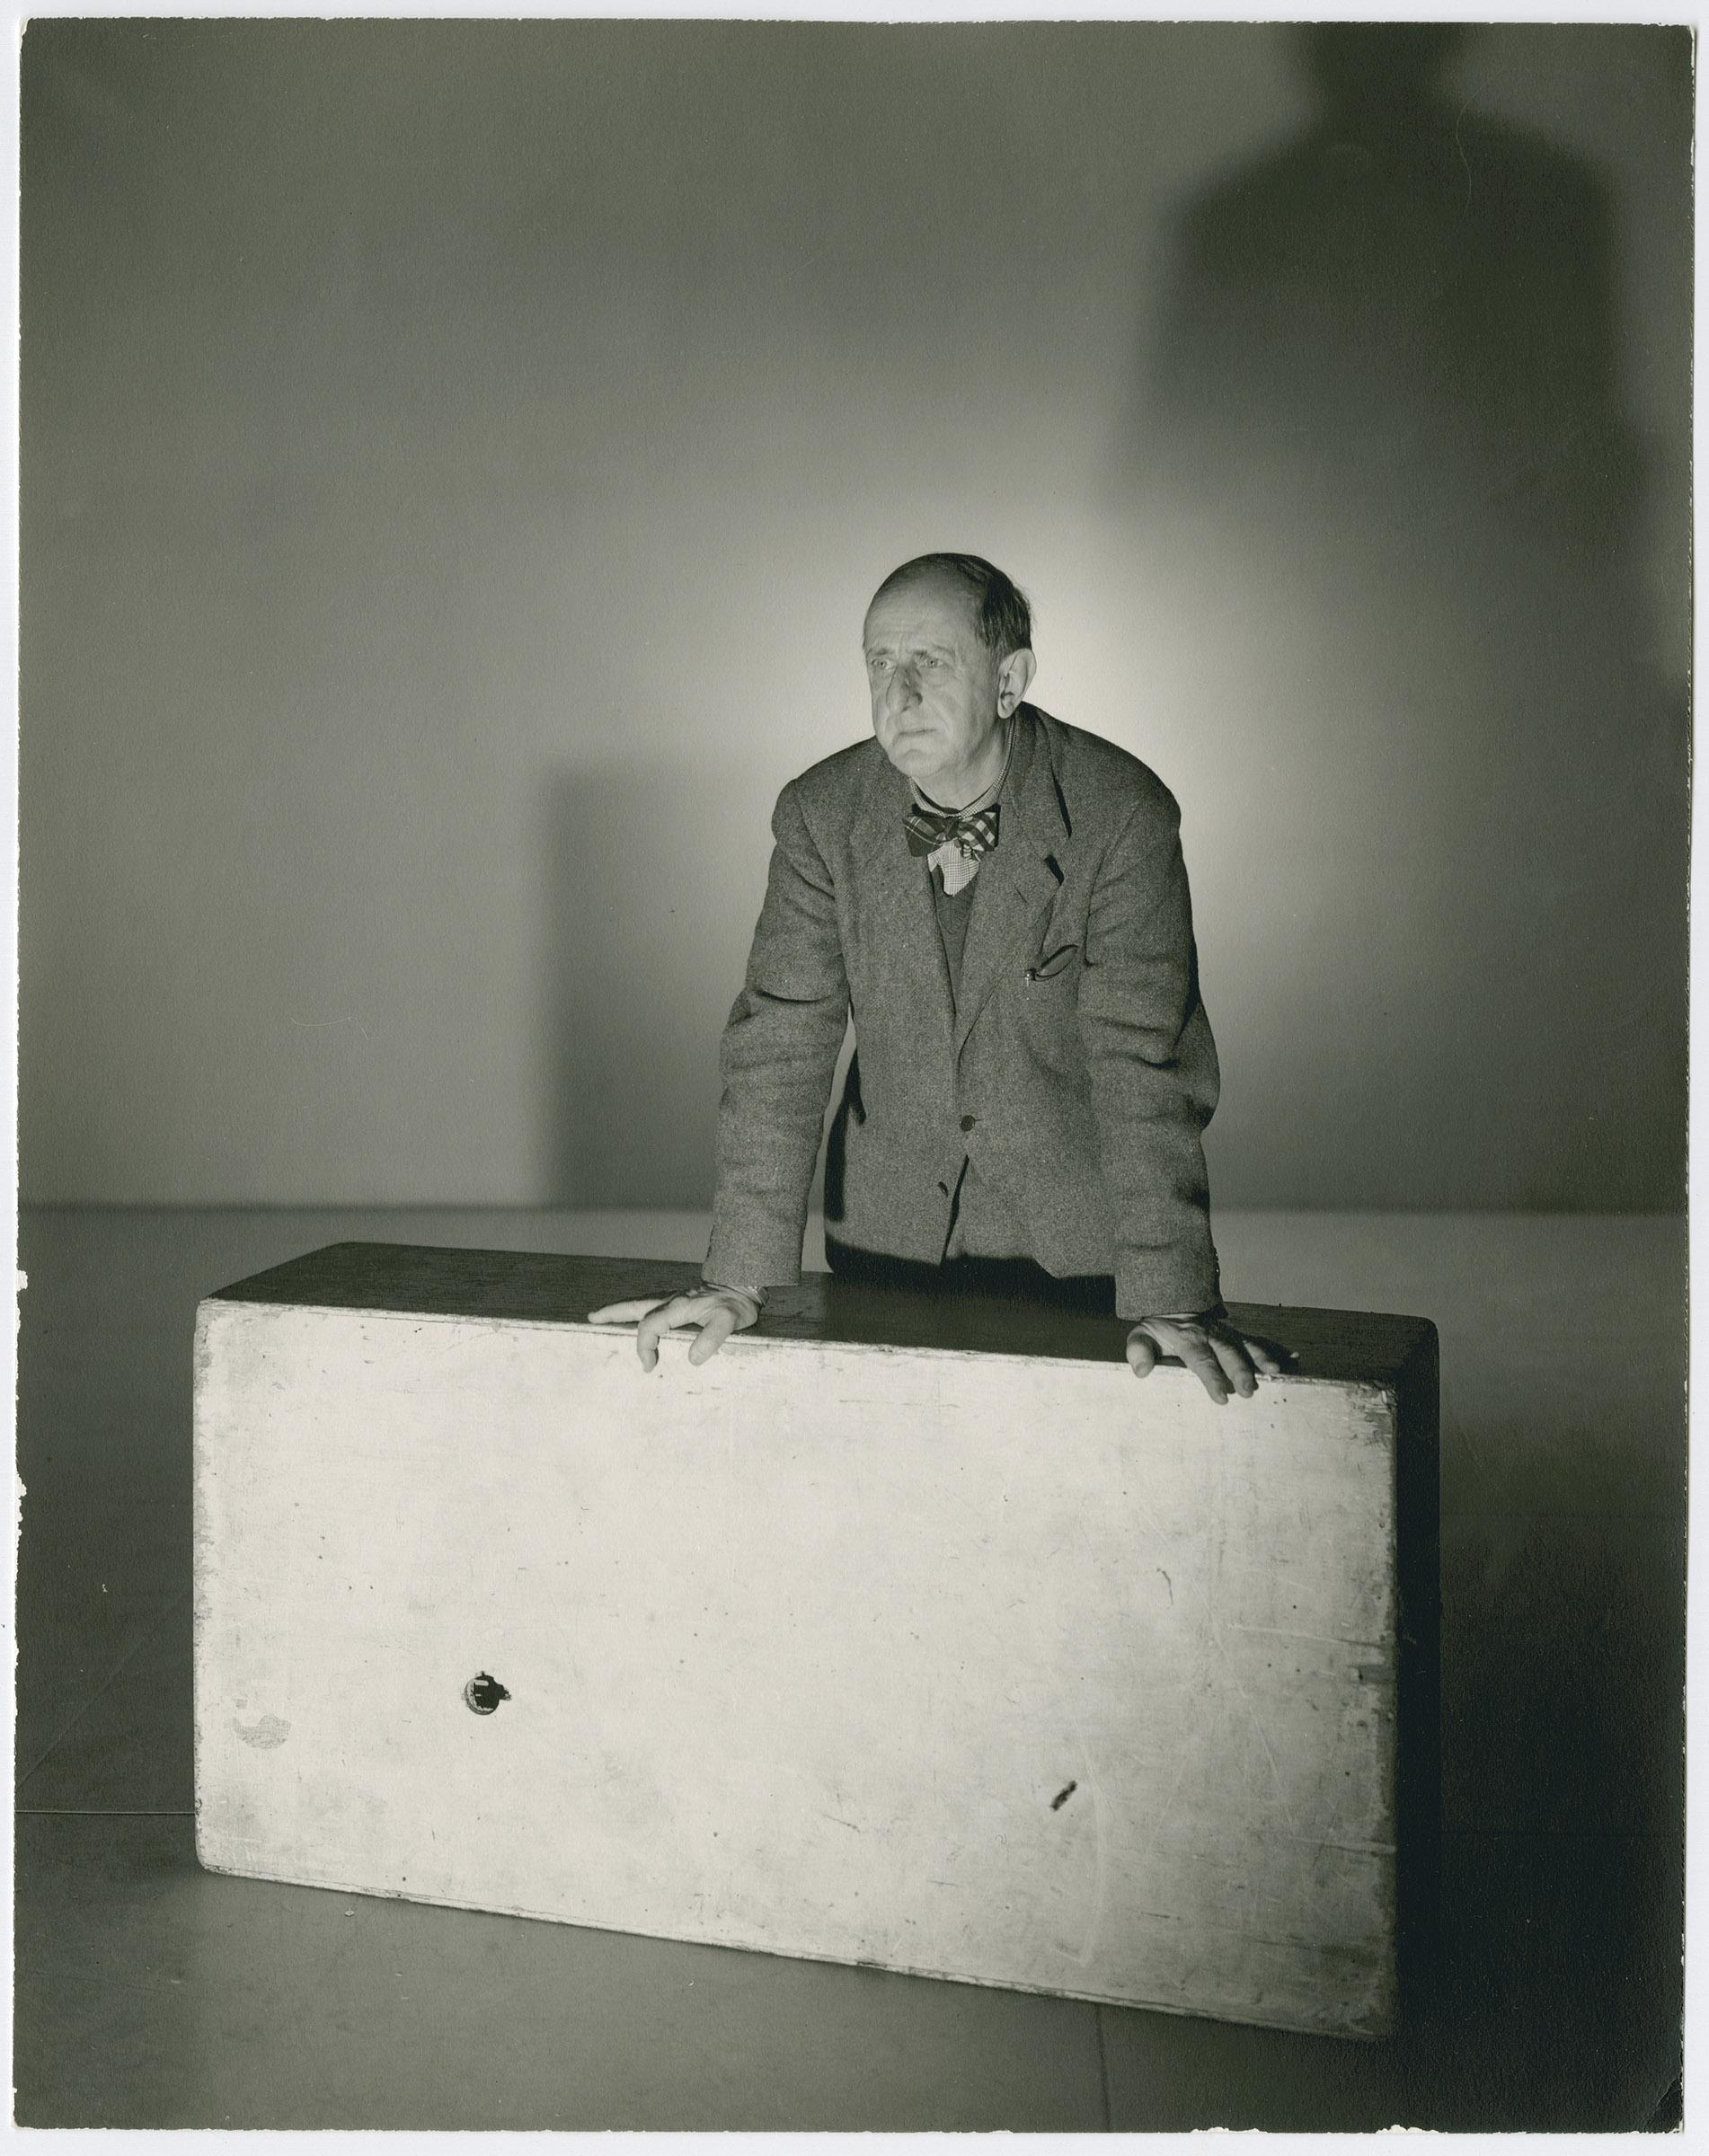 A 1943 portrait of artist Marsden Hartley by photographer George Platt Lynes. Marsden Hartley Memorial Collection, Bates College Museum of Art.